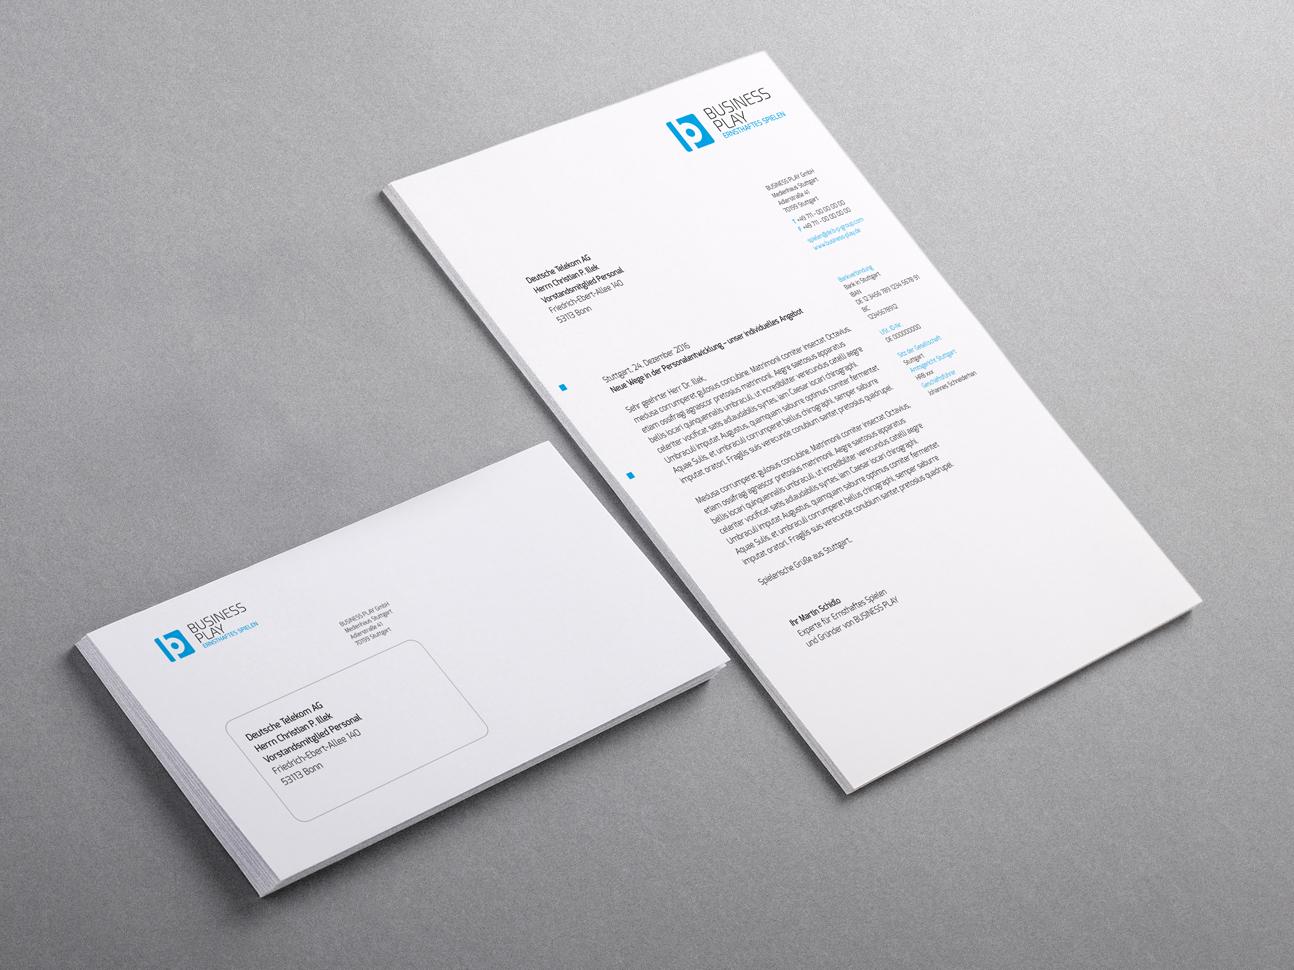 martin zech design, corporate-design, business play, briefbogen, briefumschlag